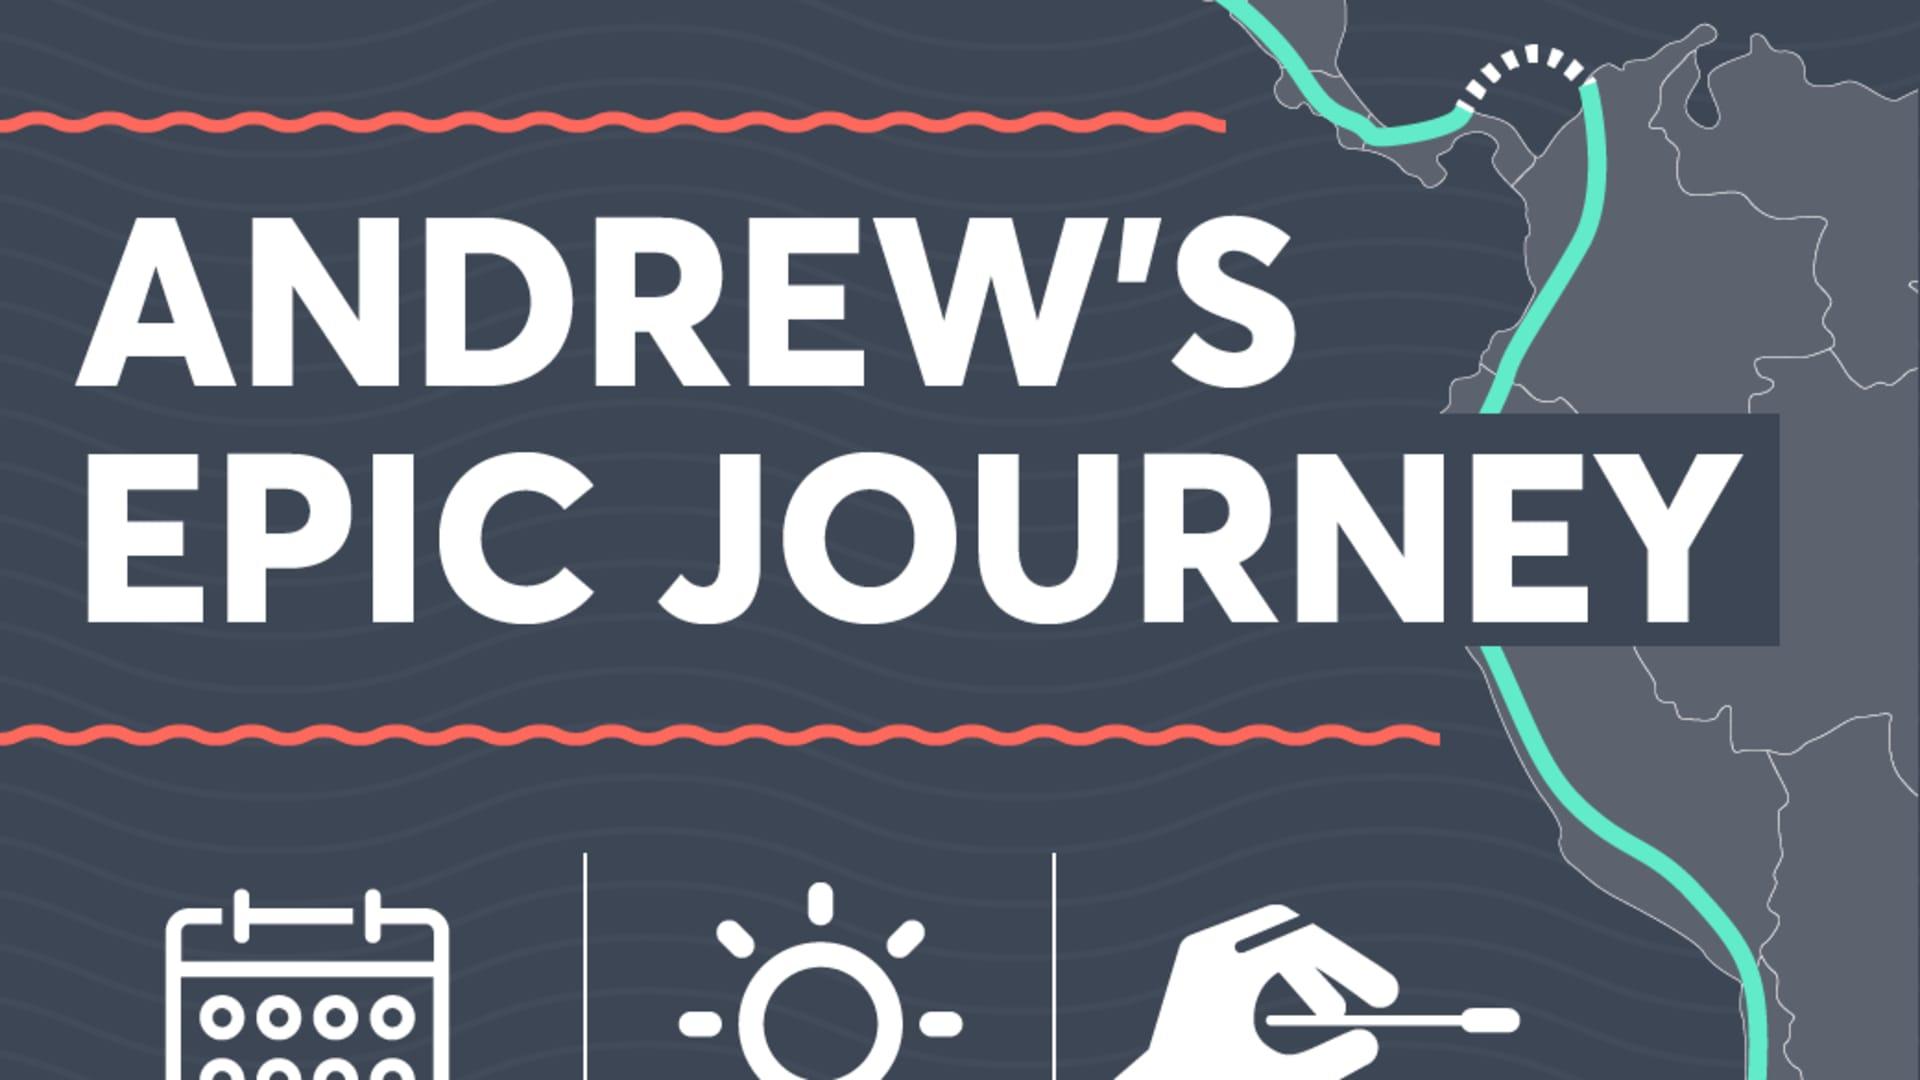 Andrew Mortensen's epic journey